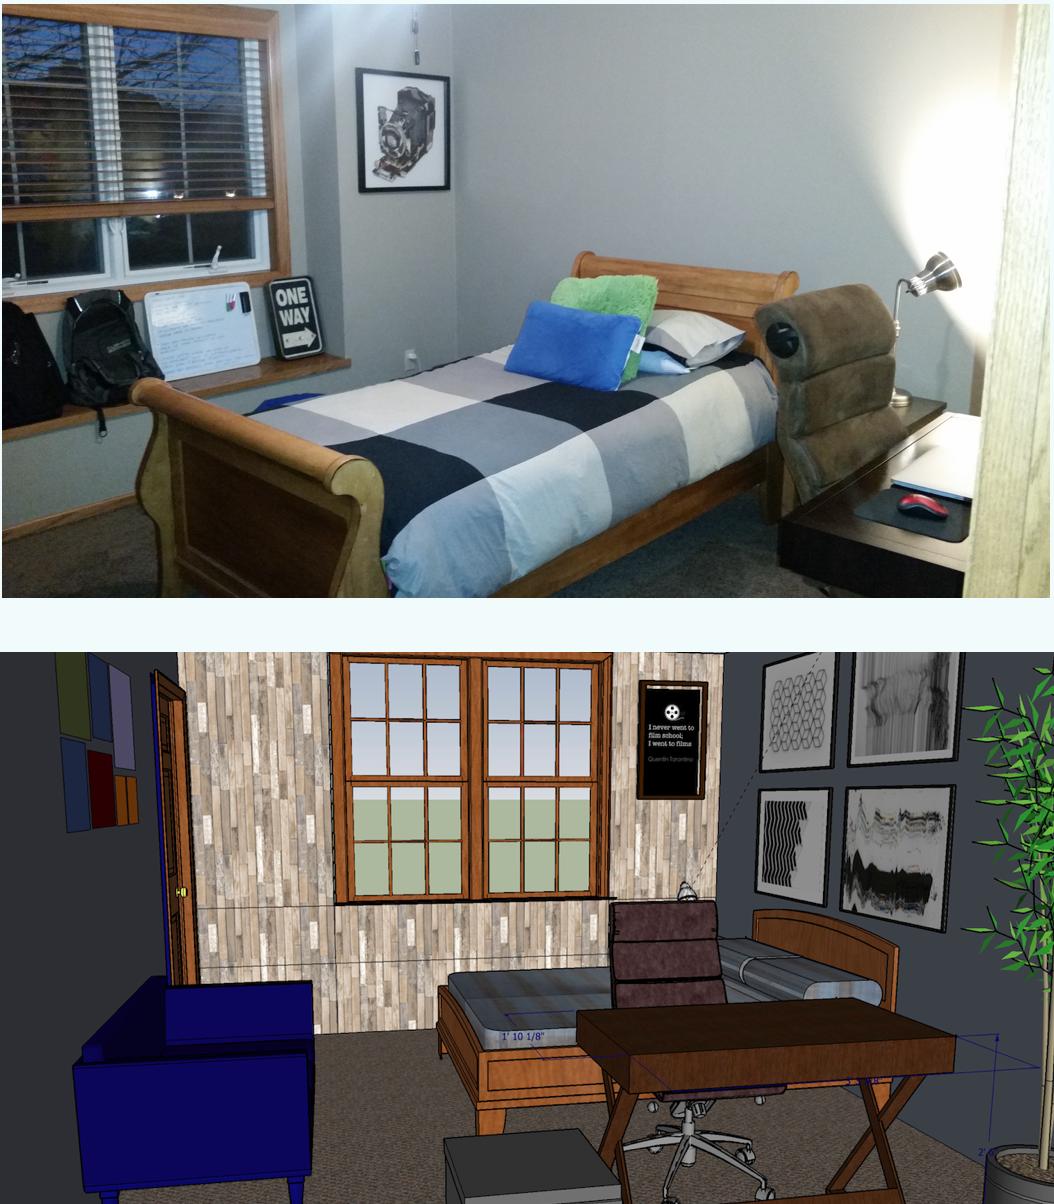 Teen boy bedroom design concept using SketchUp software   Enchanting ...